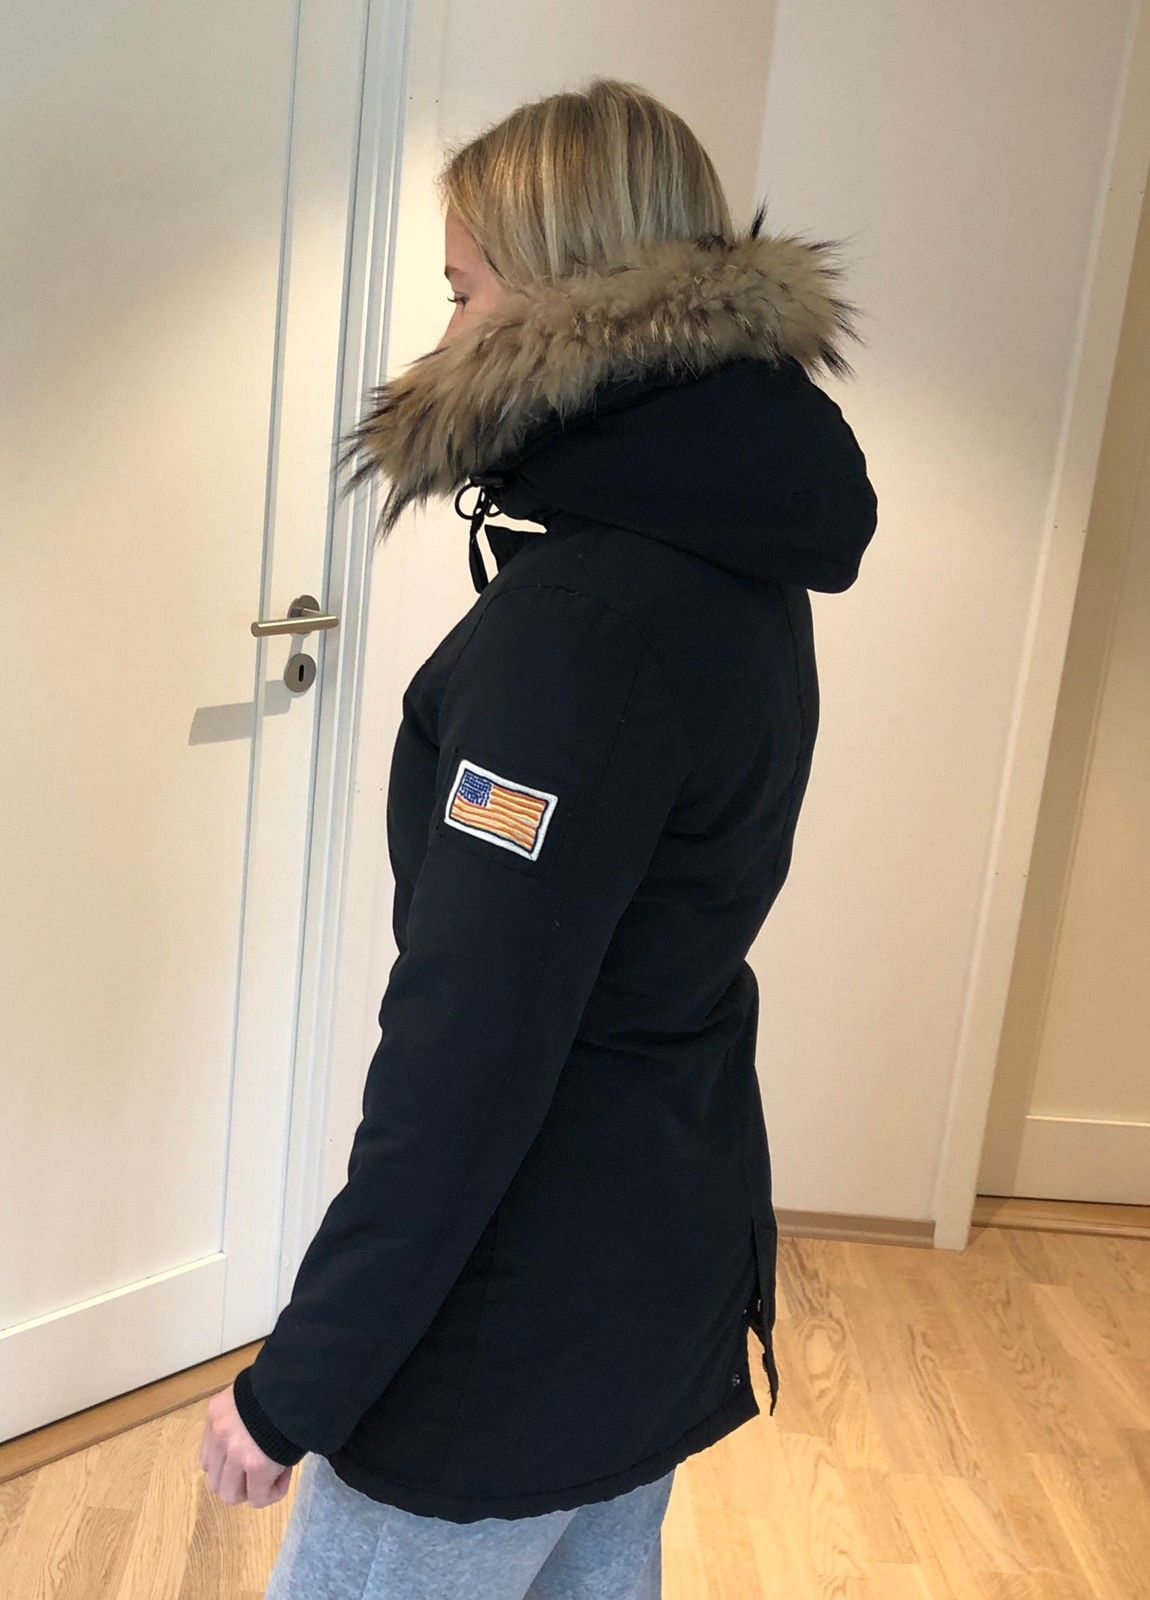 SVEA «Miss Brown» Jakke Sort modell | FINN.no